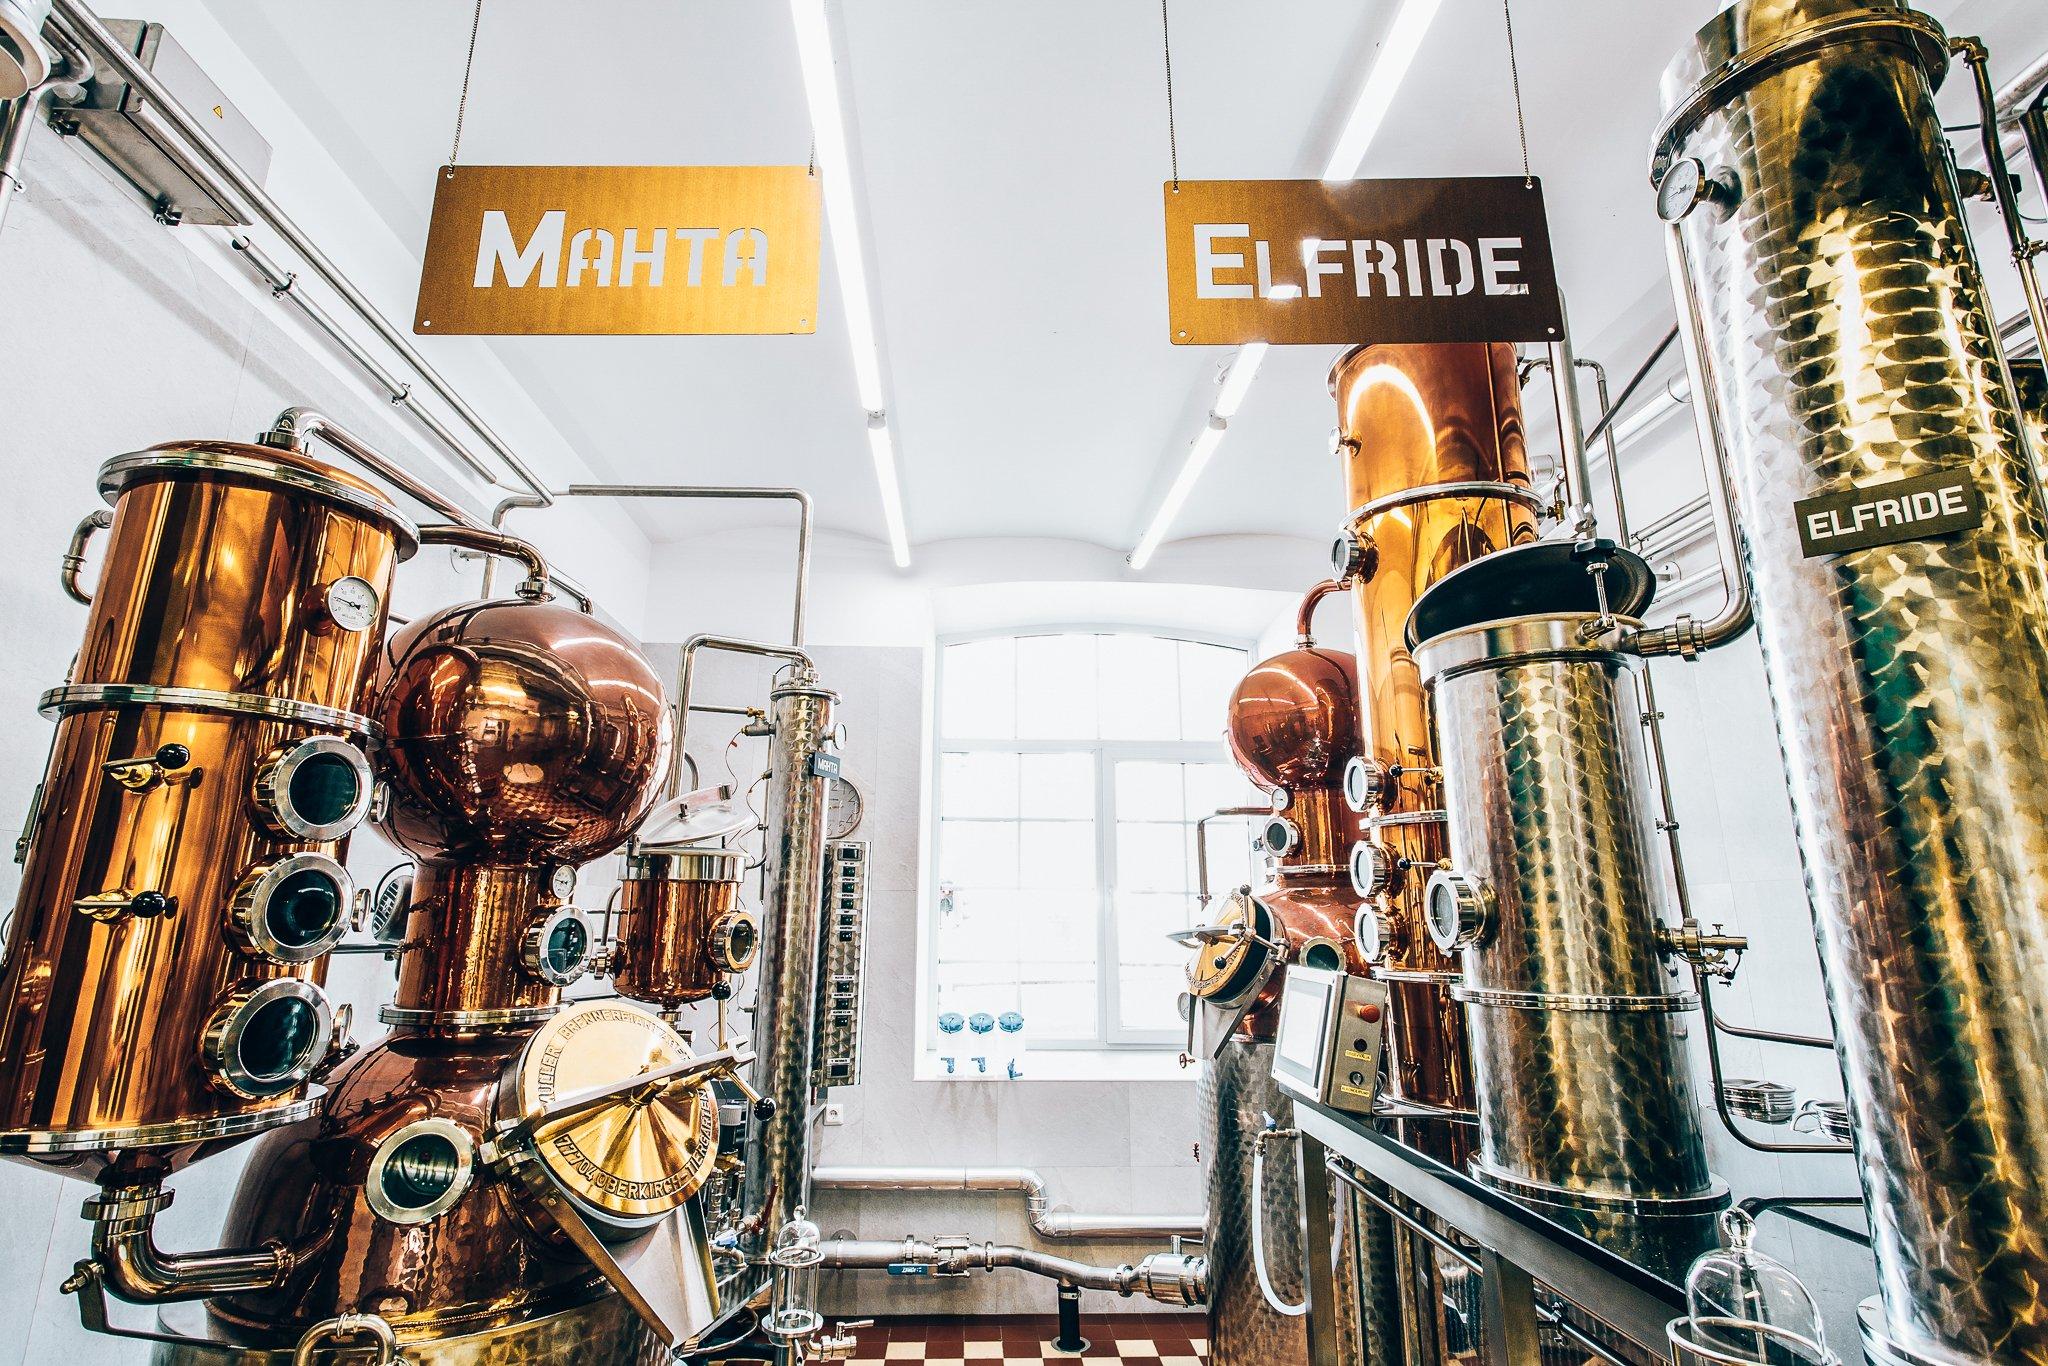 De Liviko Distillery in Estland, Crafter's Aromatic Flower Gin, Alles over gin.